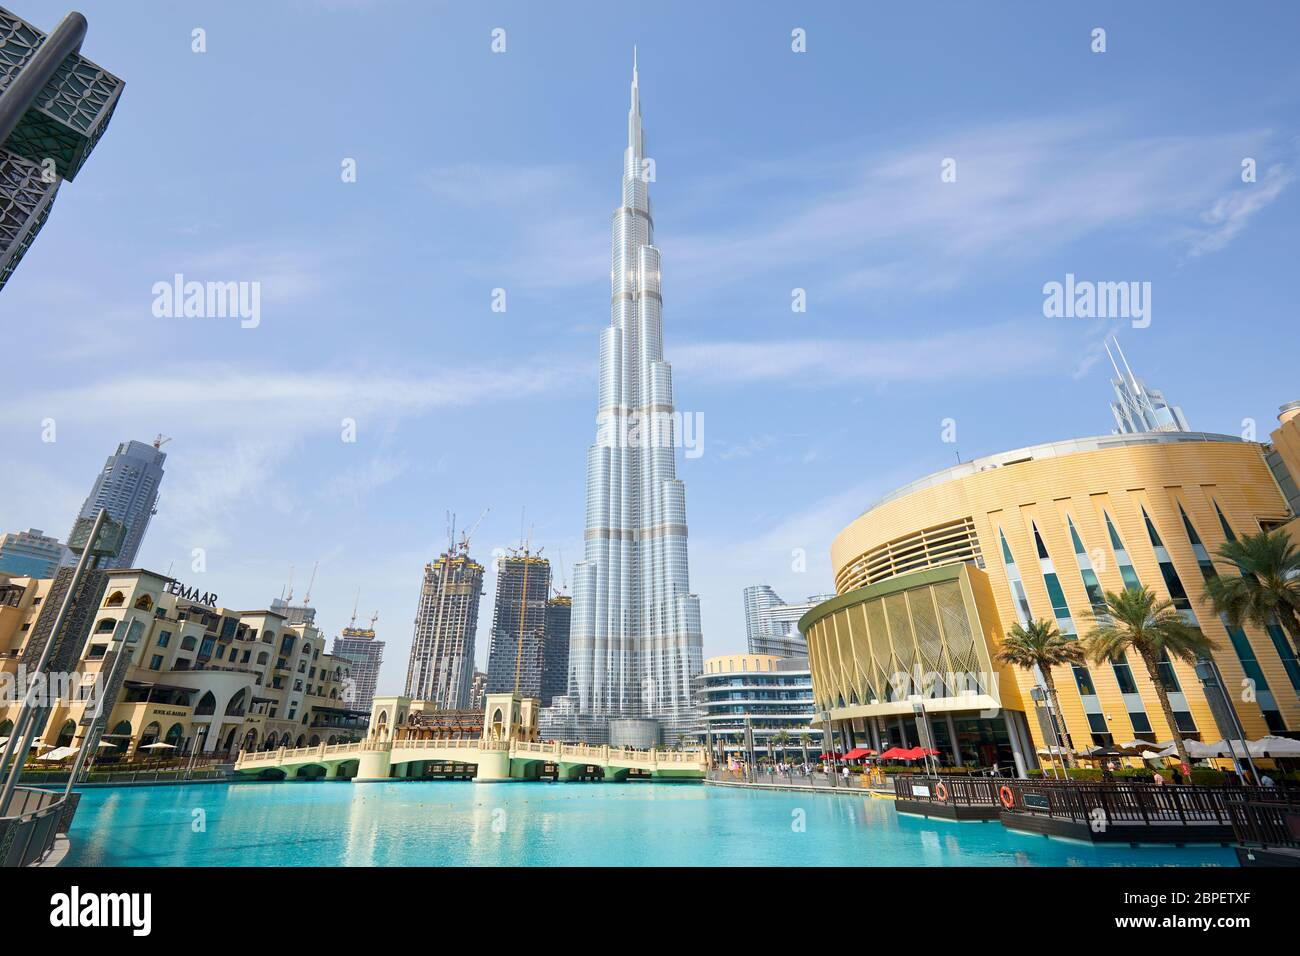 DUBAI, EMIRATOS ÁRABES UNIDOS - 19 DE NOVIEMBRE de 2019: Burj Khalifa rascacielos Dubai Mall y lago artificial en una mañana soleada Foto de stock